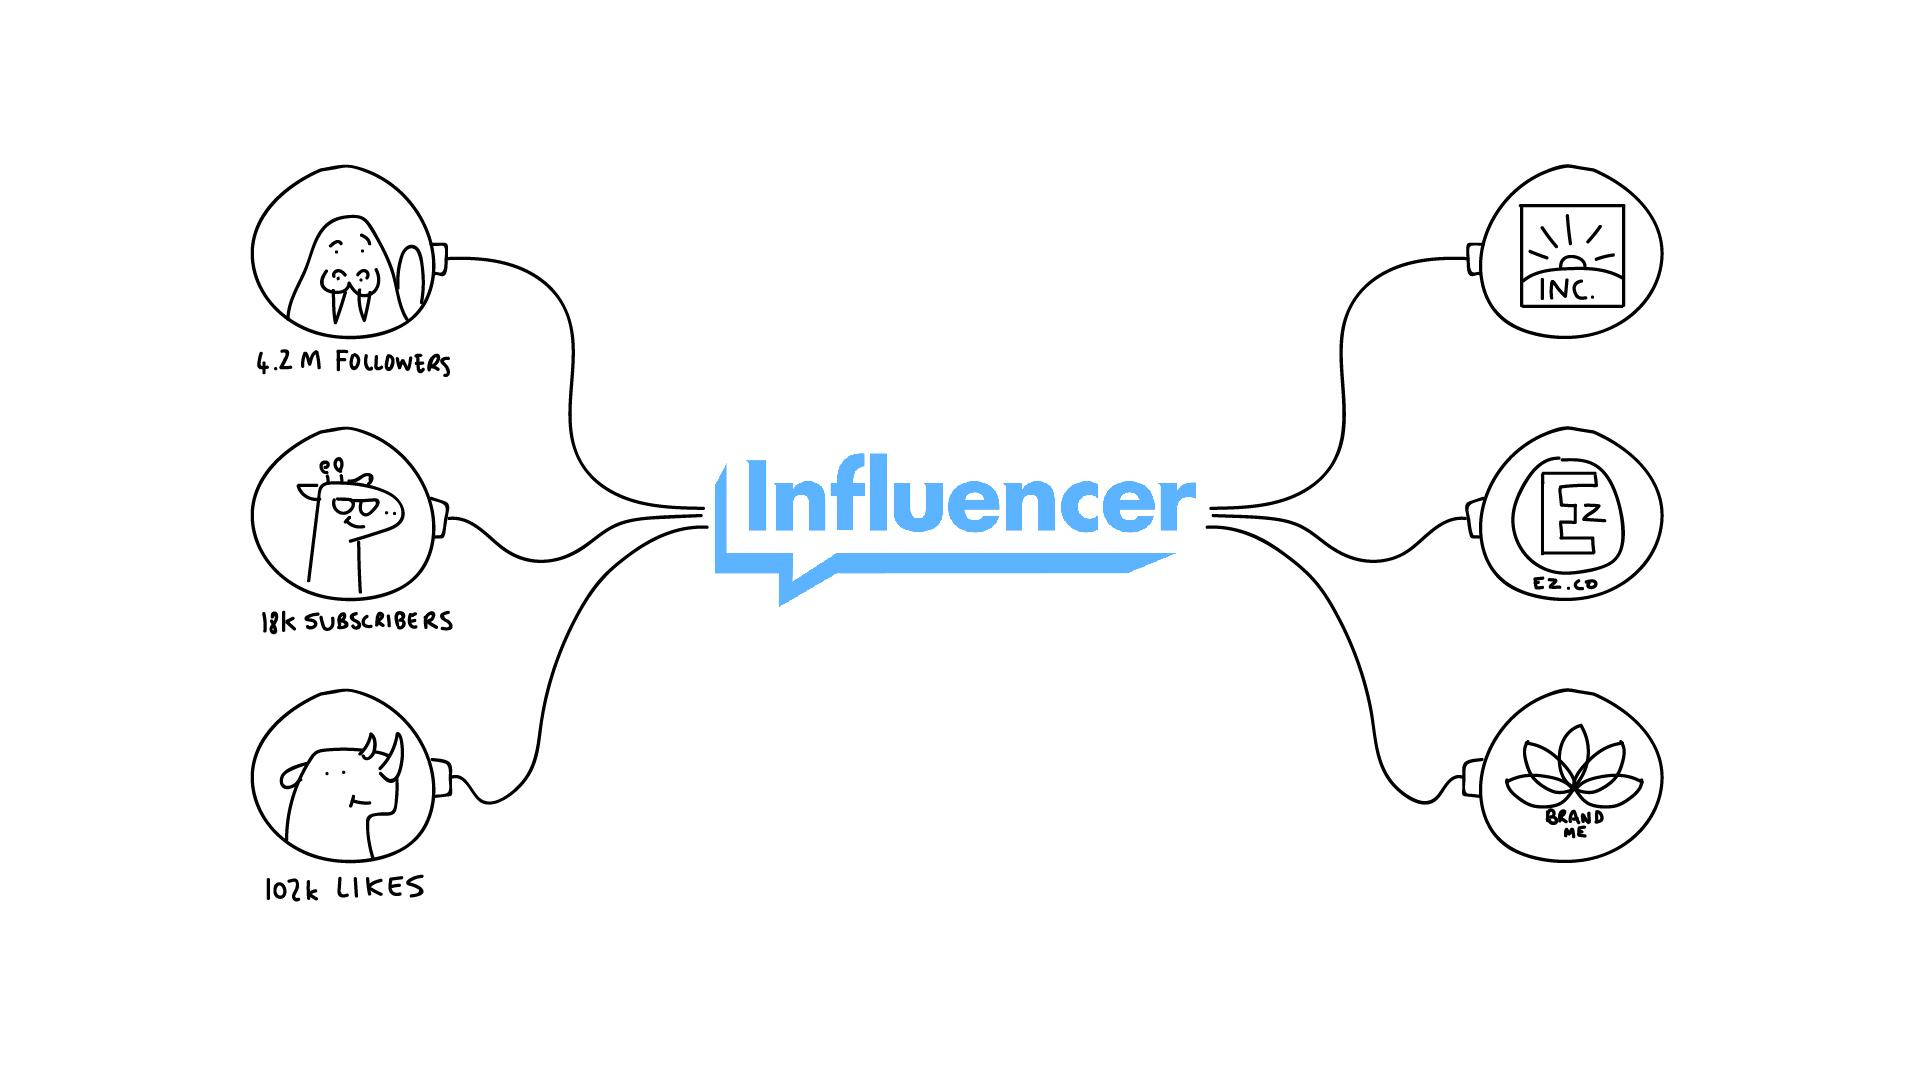 InfluencerArtboard 1 copy 4_Storyboards.jpg